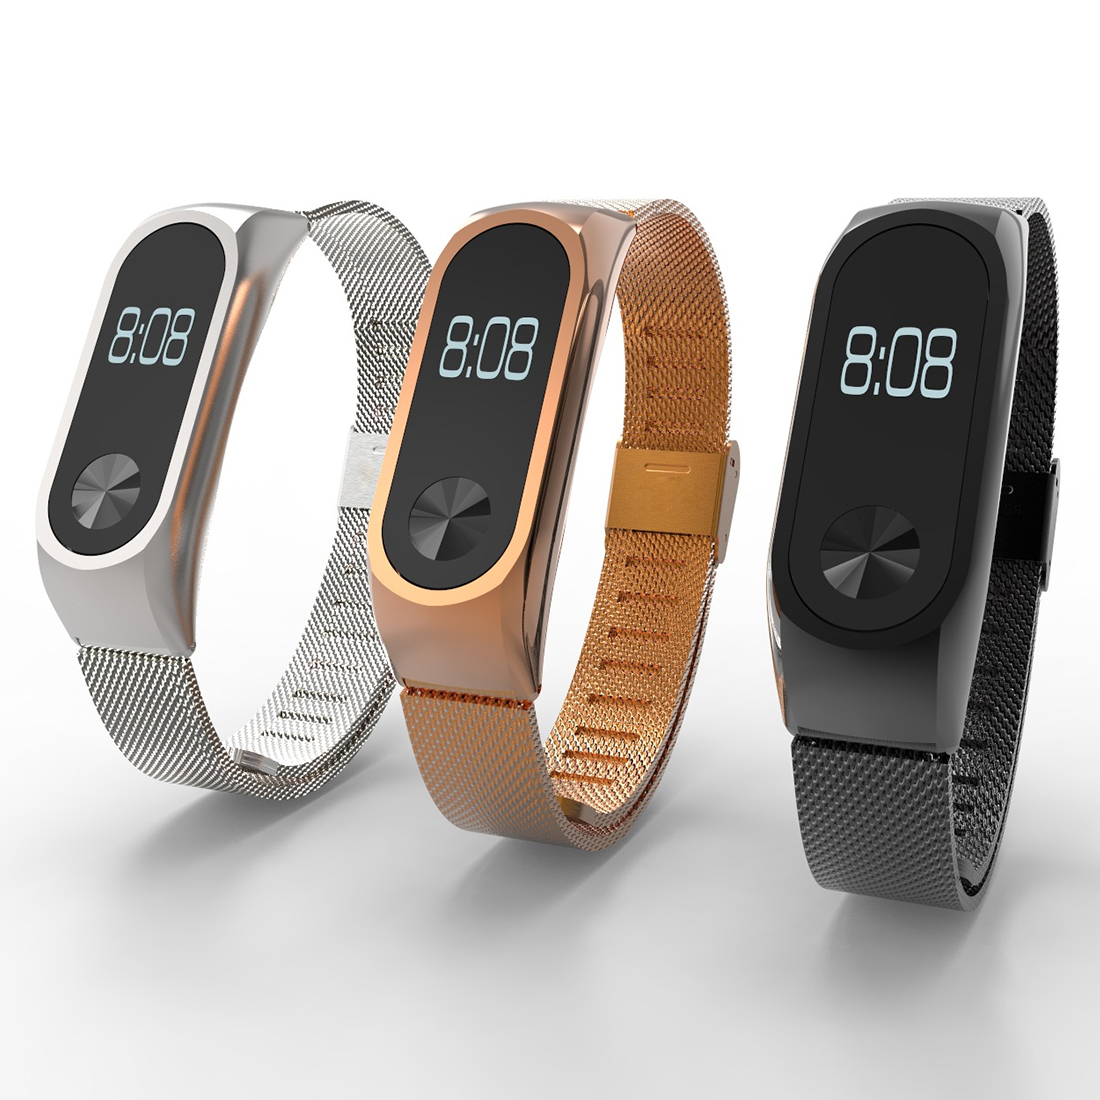 New Fashion High Quality Watch Strap for Xiaomi Mi Band 2 Straps Bracelet for Mi Band 2 Band Miband 2 Wrist Strap Belt